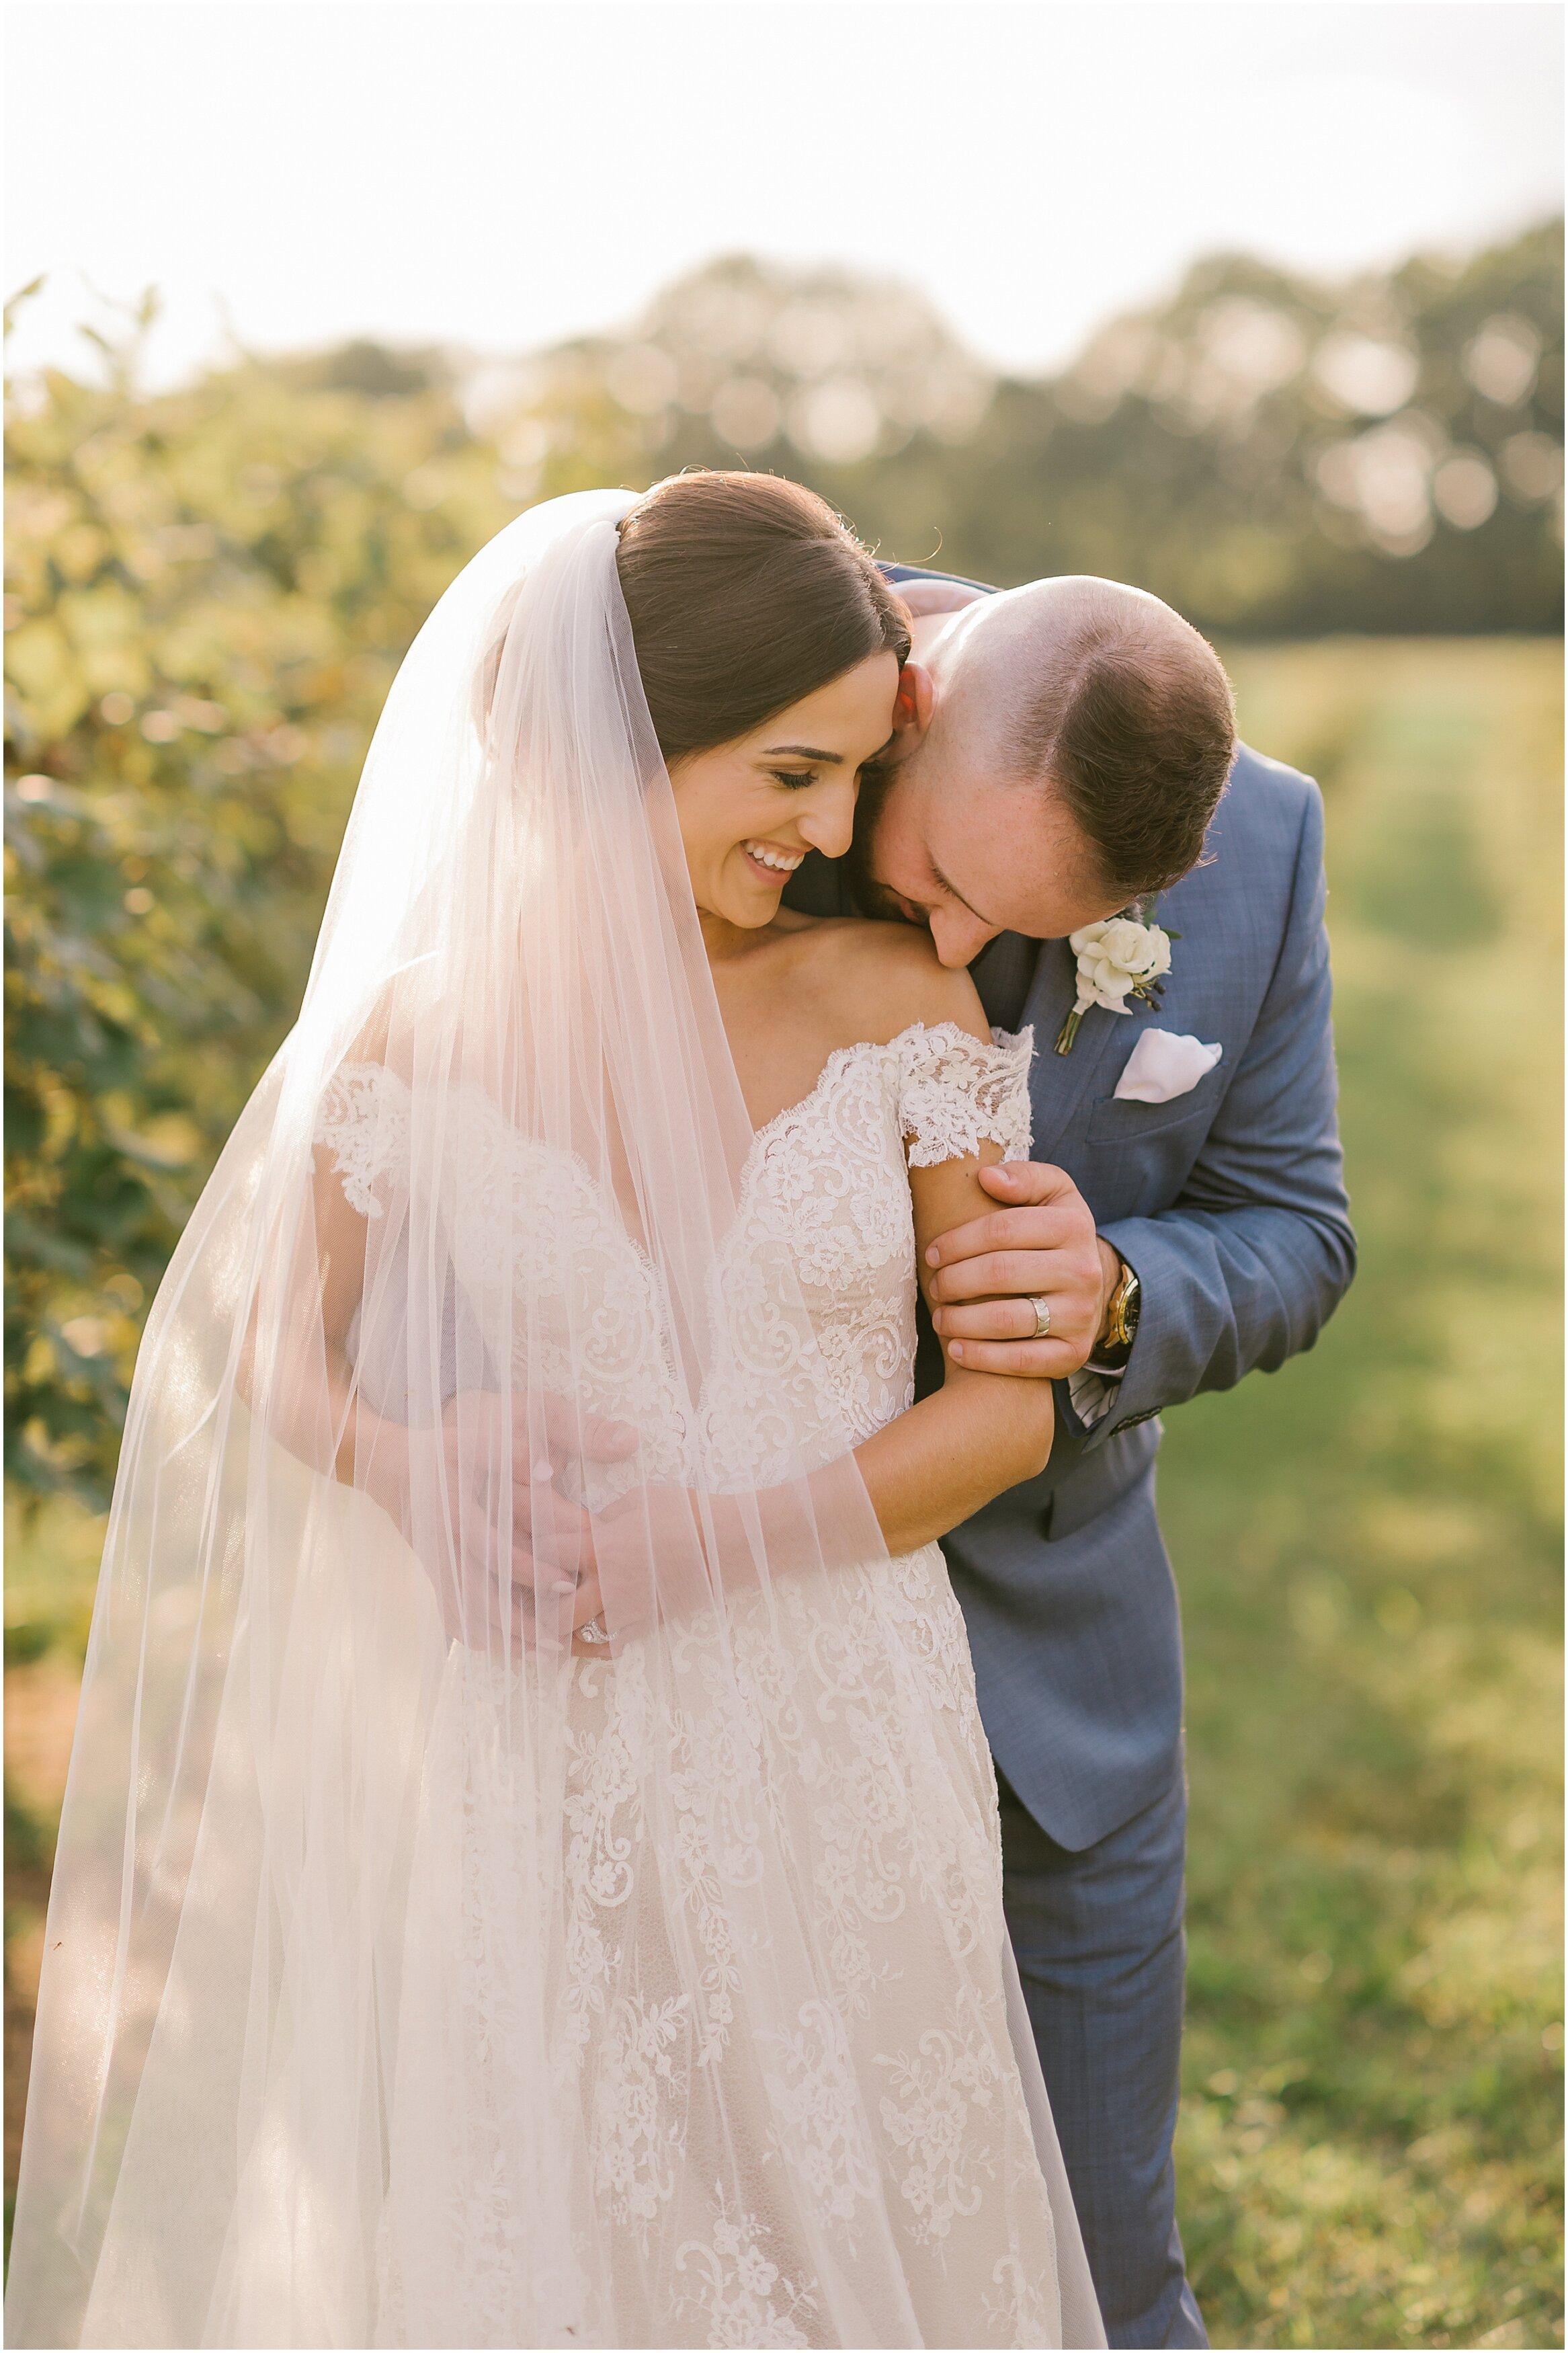 Rebecca Shehorn Photography Indianapolis Wedding Photographer Sycamore at Mallow Run_0764.jpg